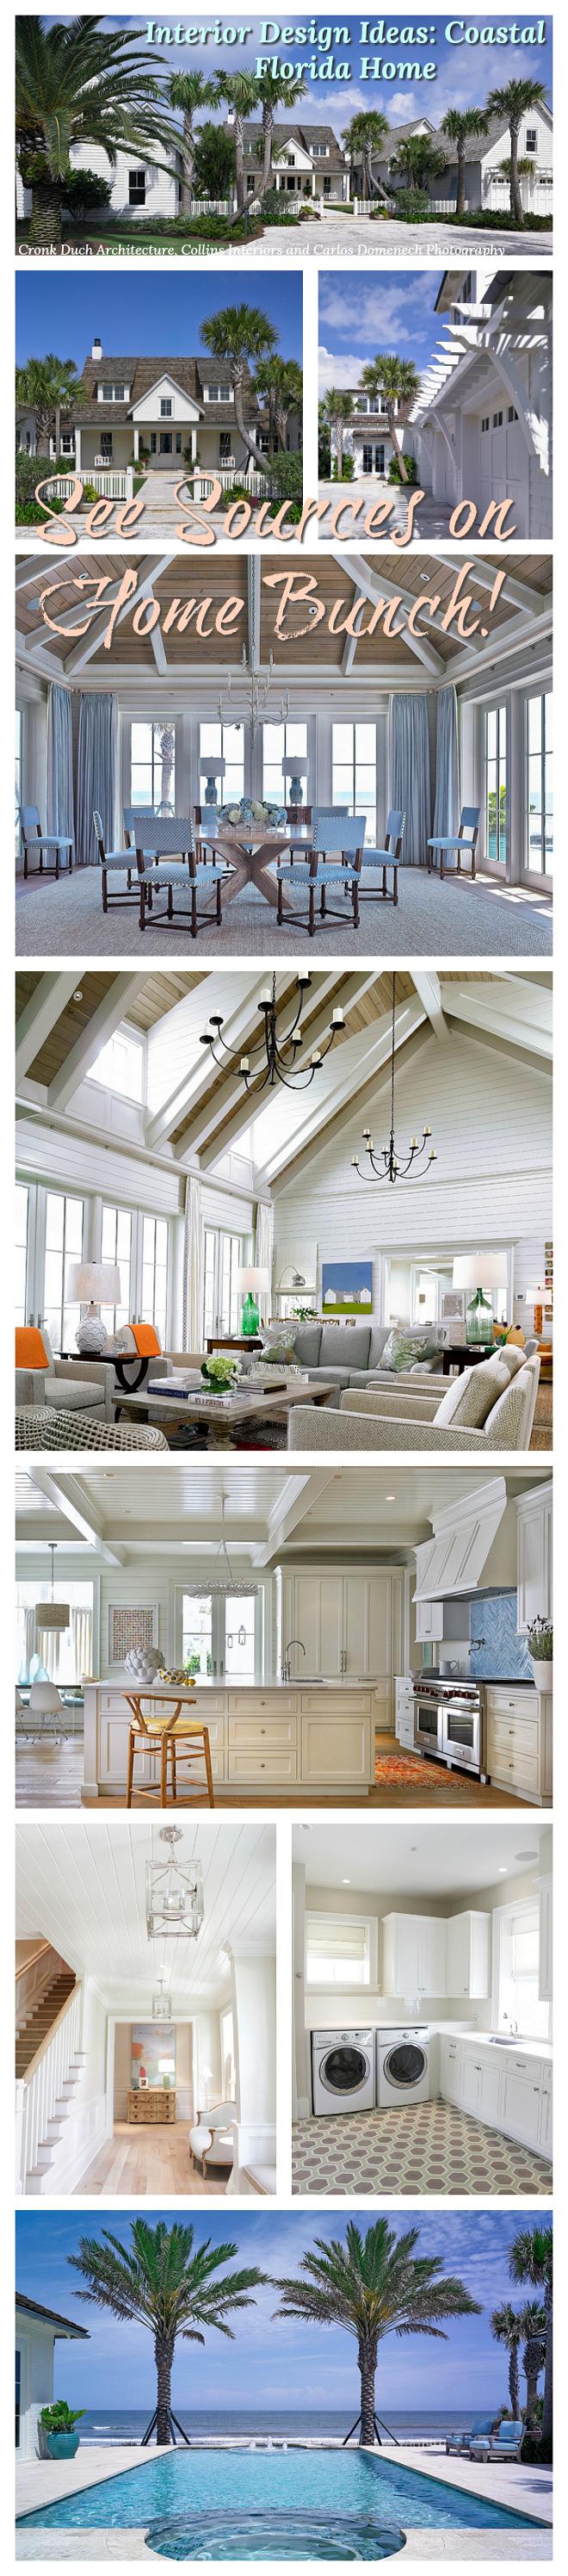 Interior Design Ideas Coastal Florida Home interior decor sources paint colors on Home Bunch